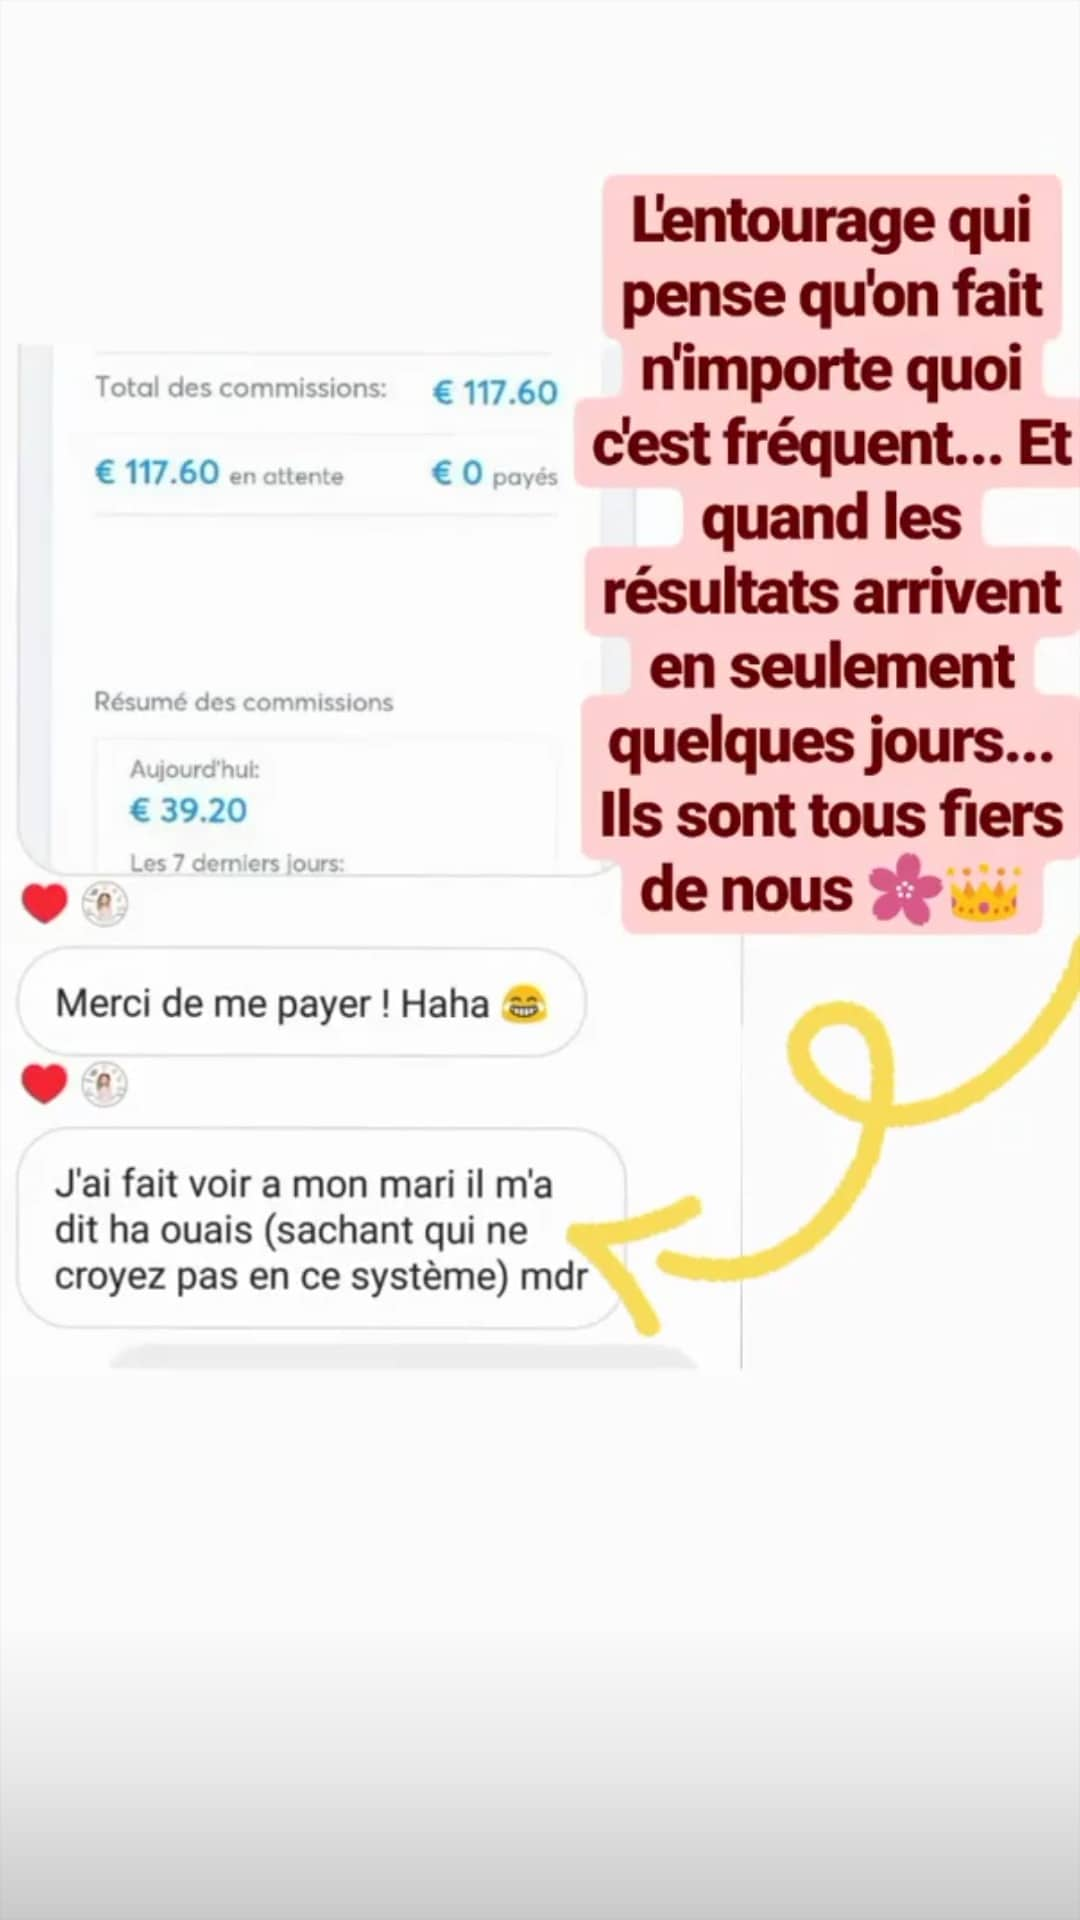 Avis-Les-Reines-Affiliation_20200605_084656